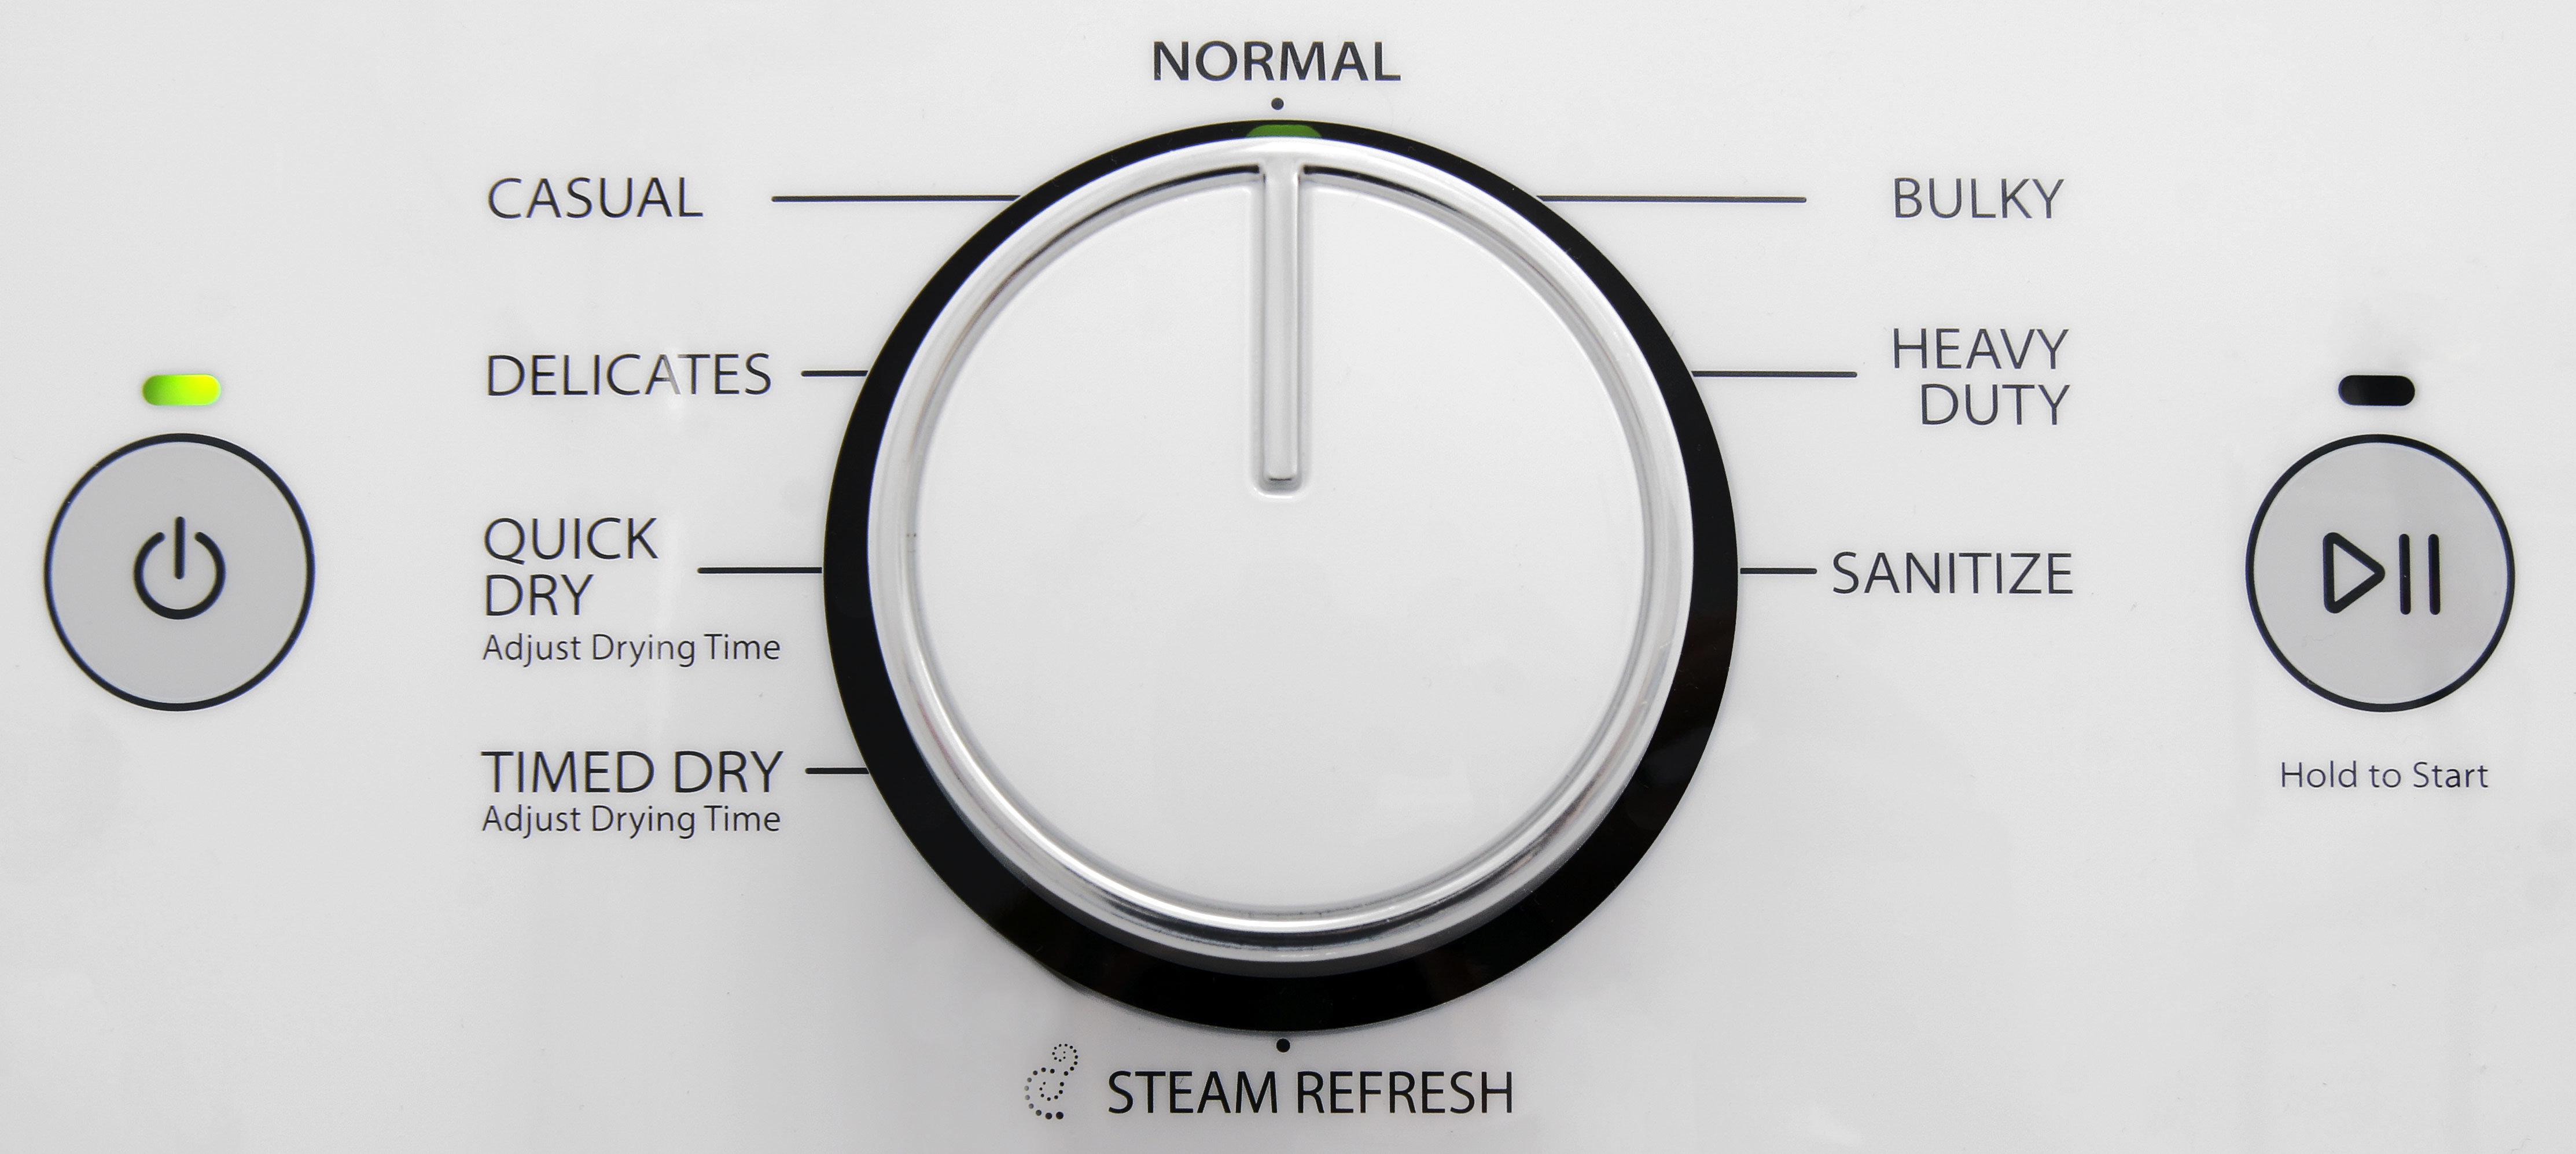 100 whirlpool duet steam electric dryer manual whirlpool